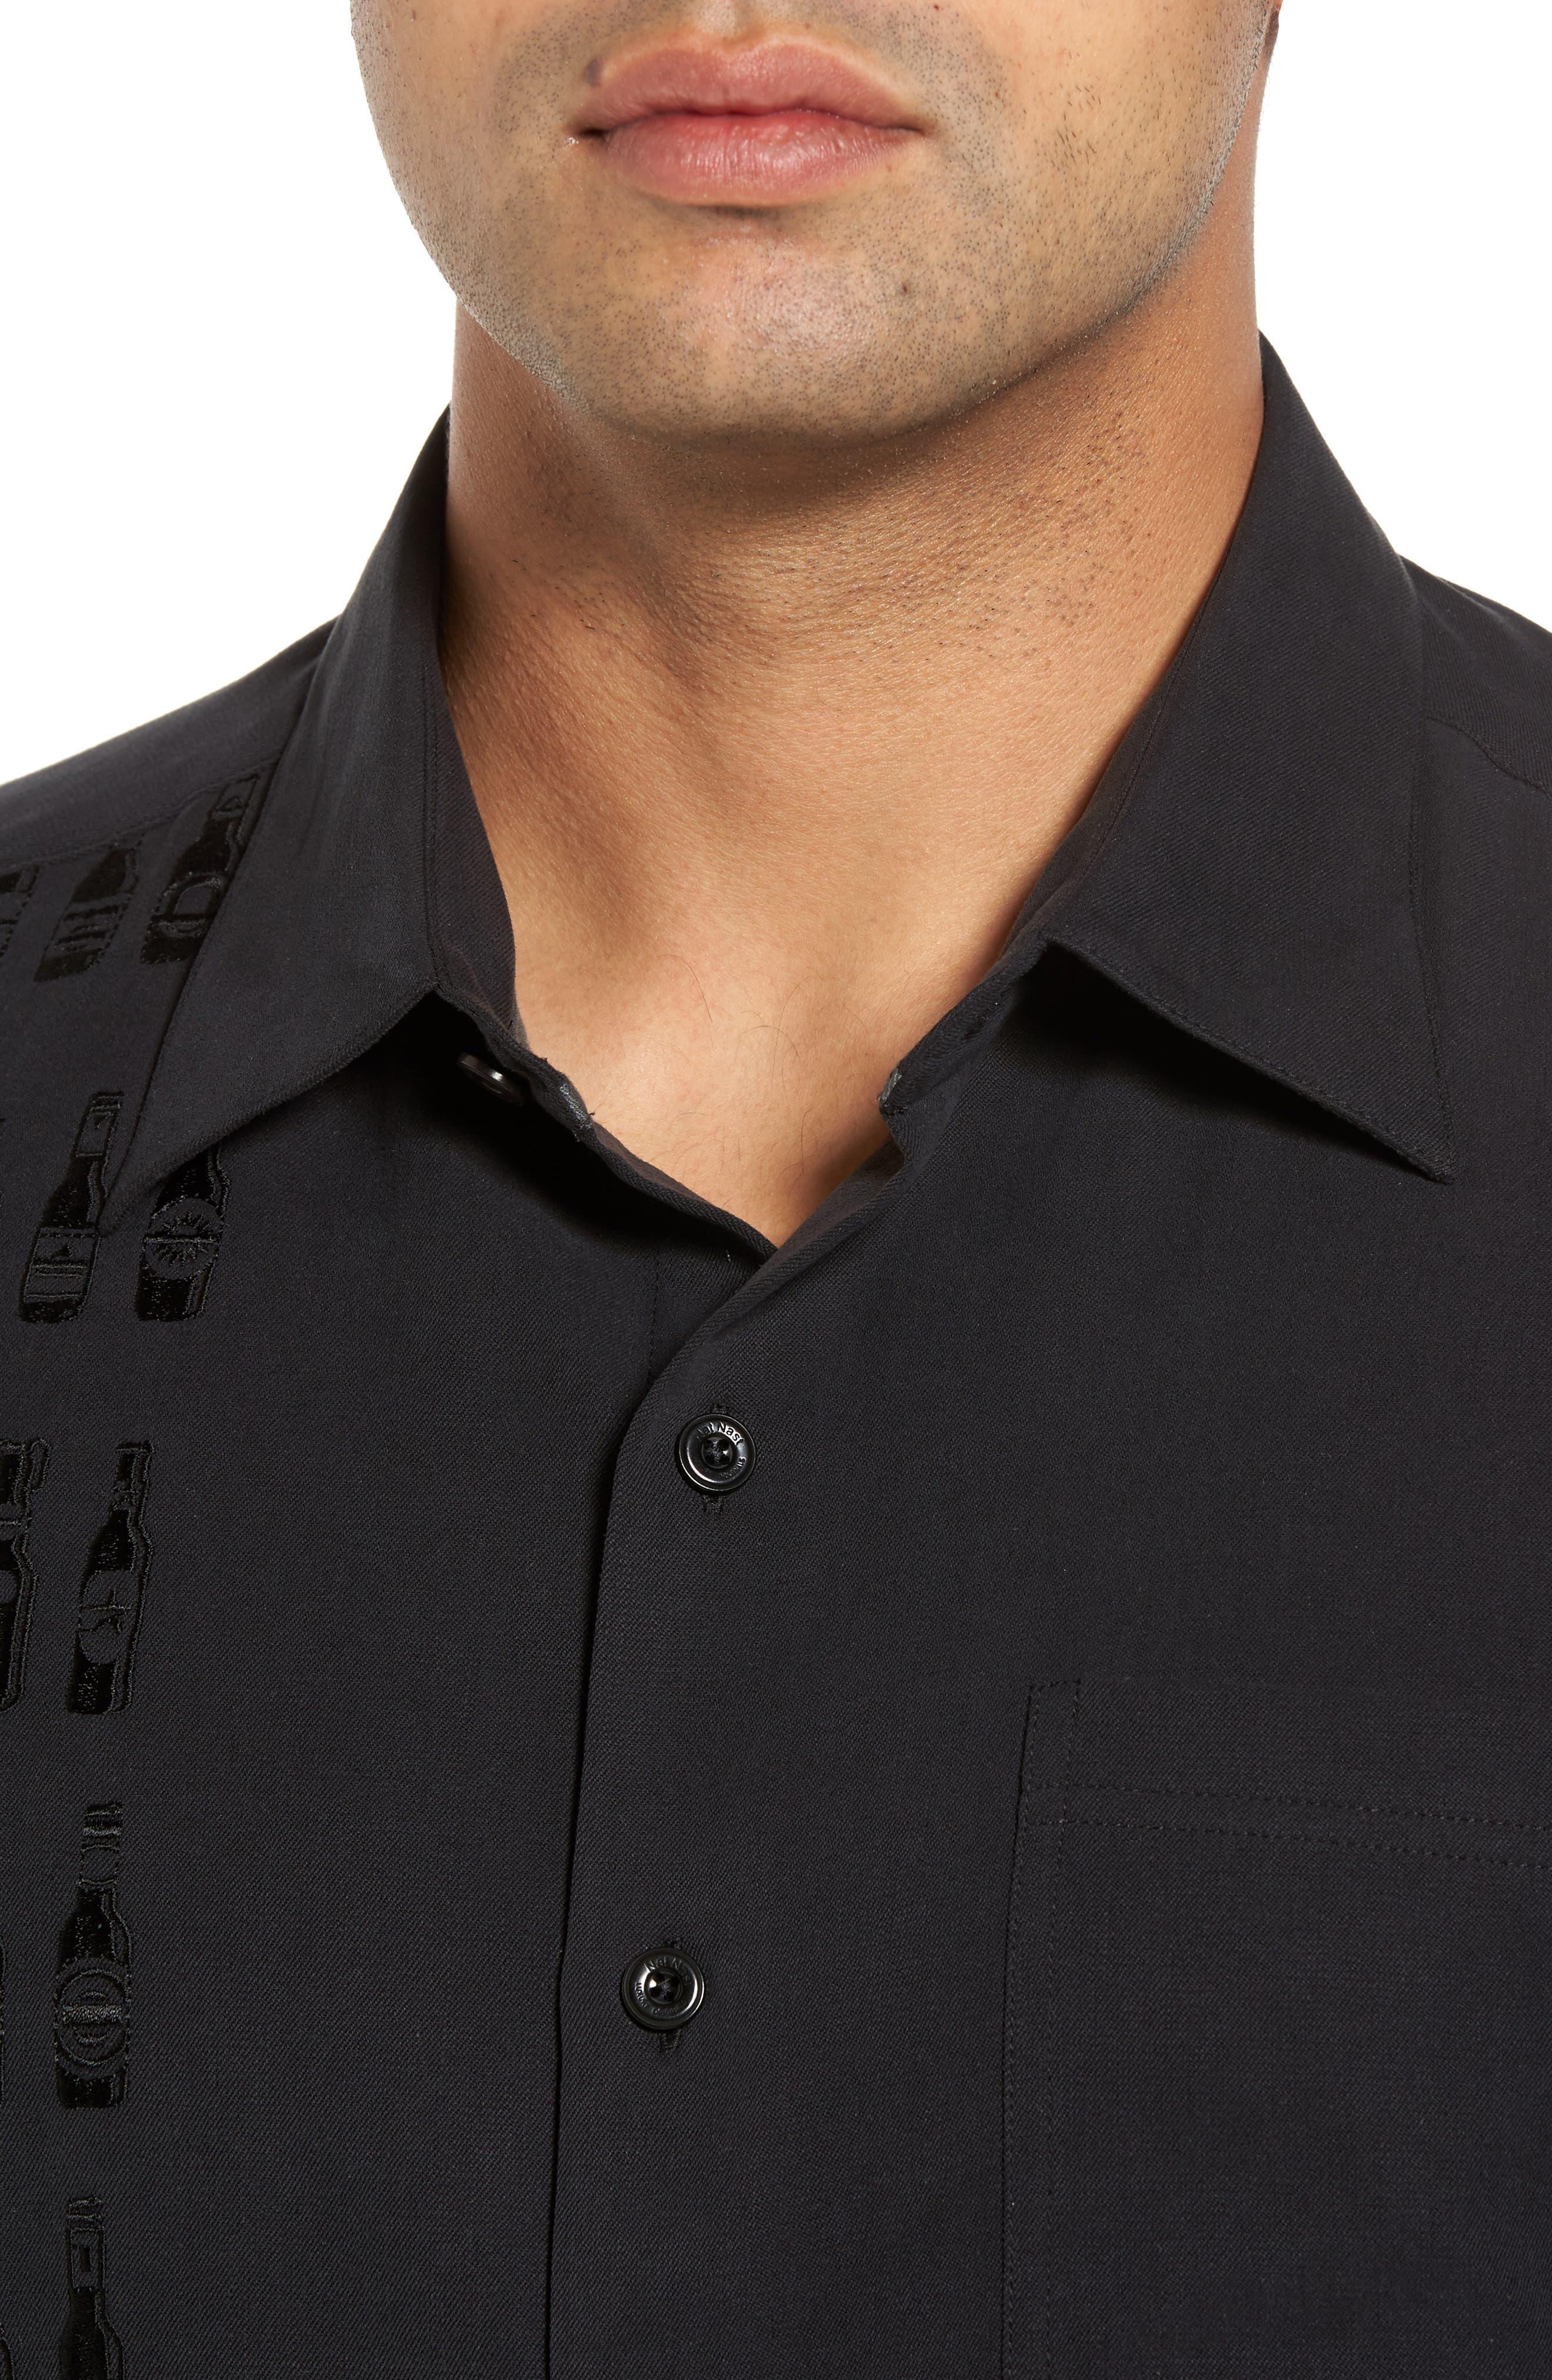 Summit Regular Fit Embroidered Silk Blend Sport Shirt,                             Alternate thumbnail 4, color,                             Black